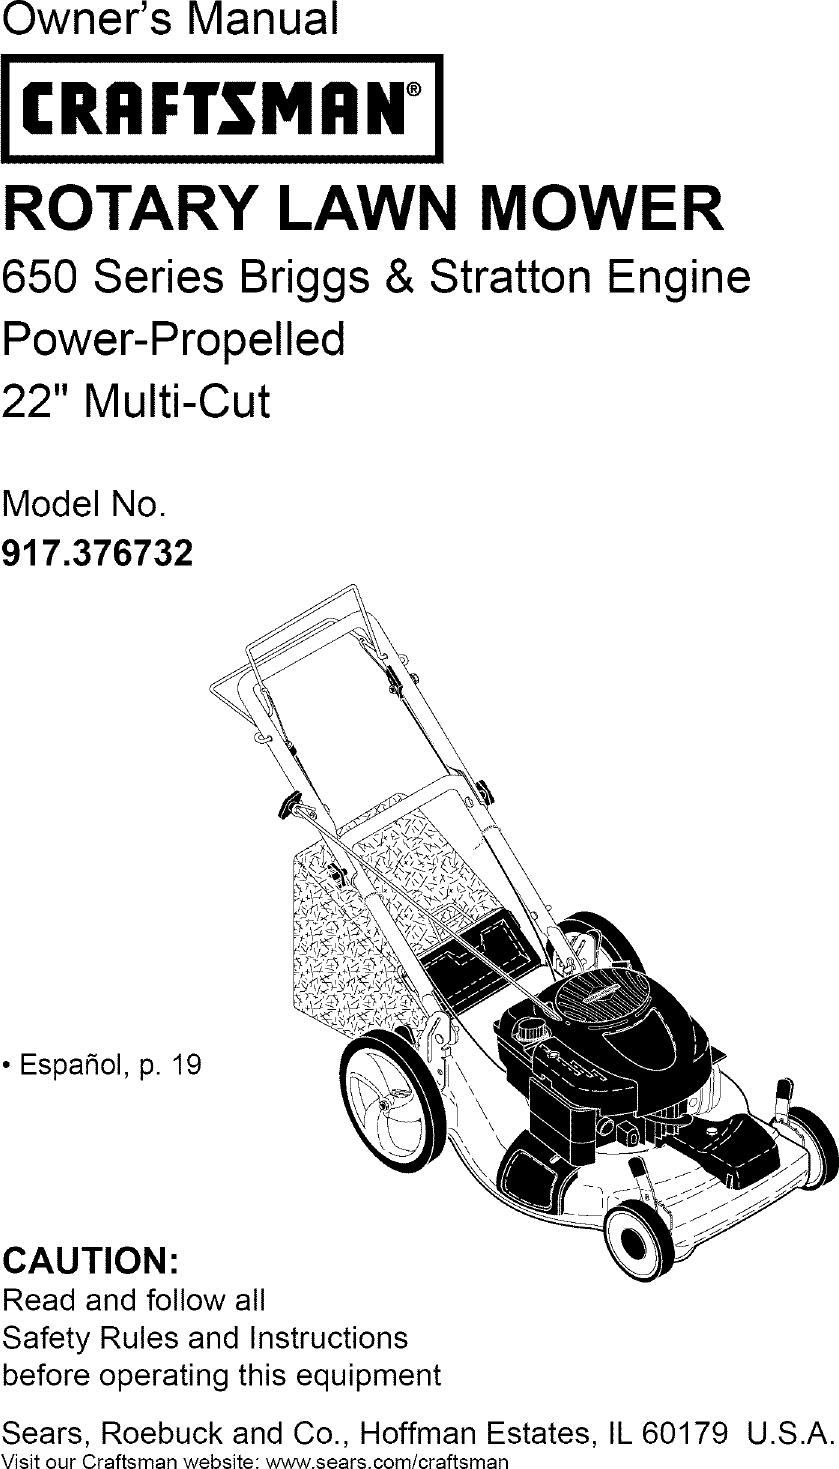 Craftsman 917376732 User Manual LAWN MOWER Manuals And